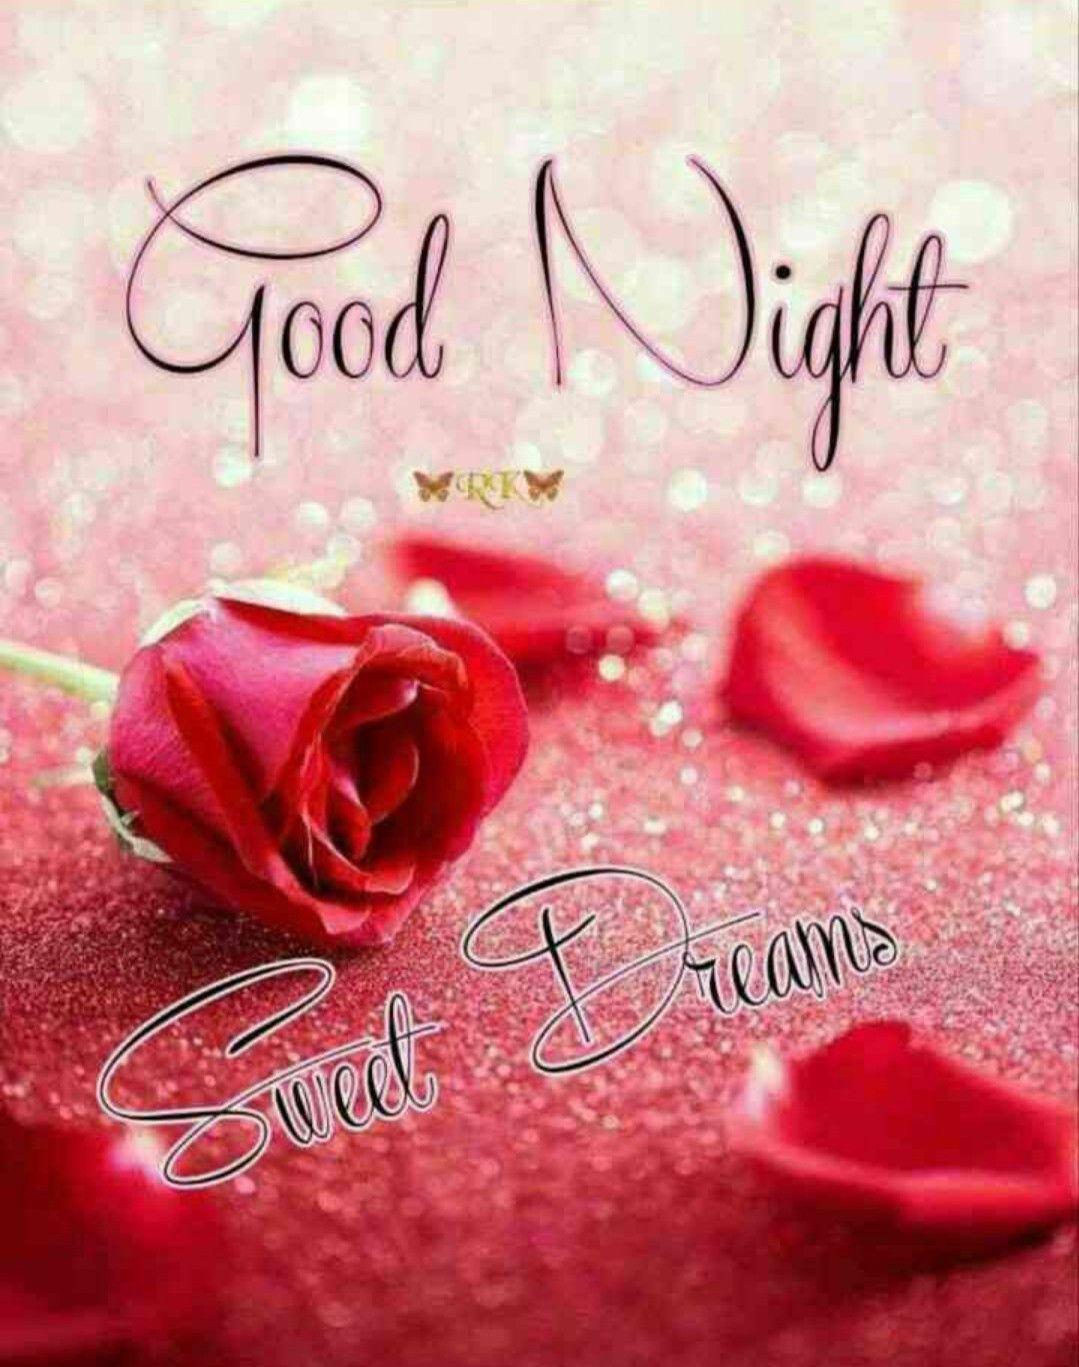 Good Night Sweetest dreams